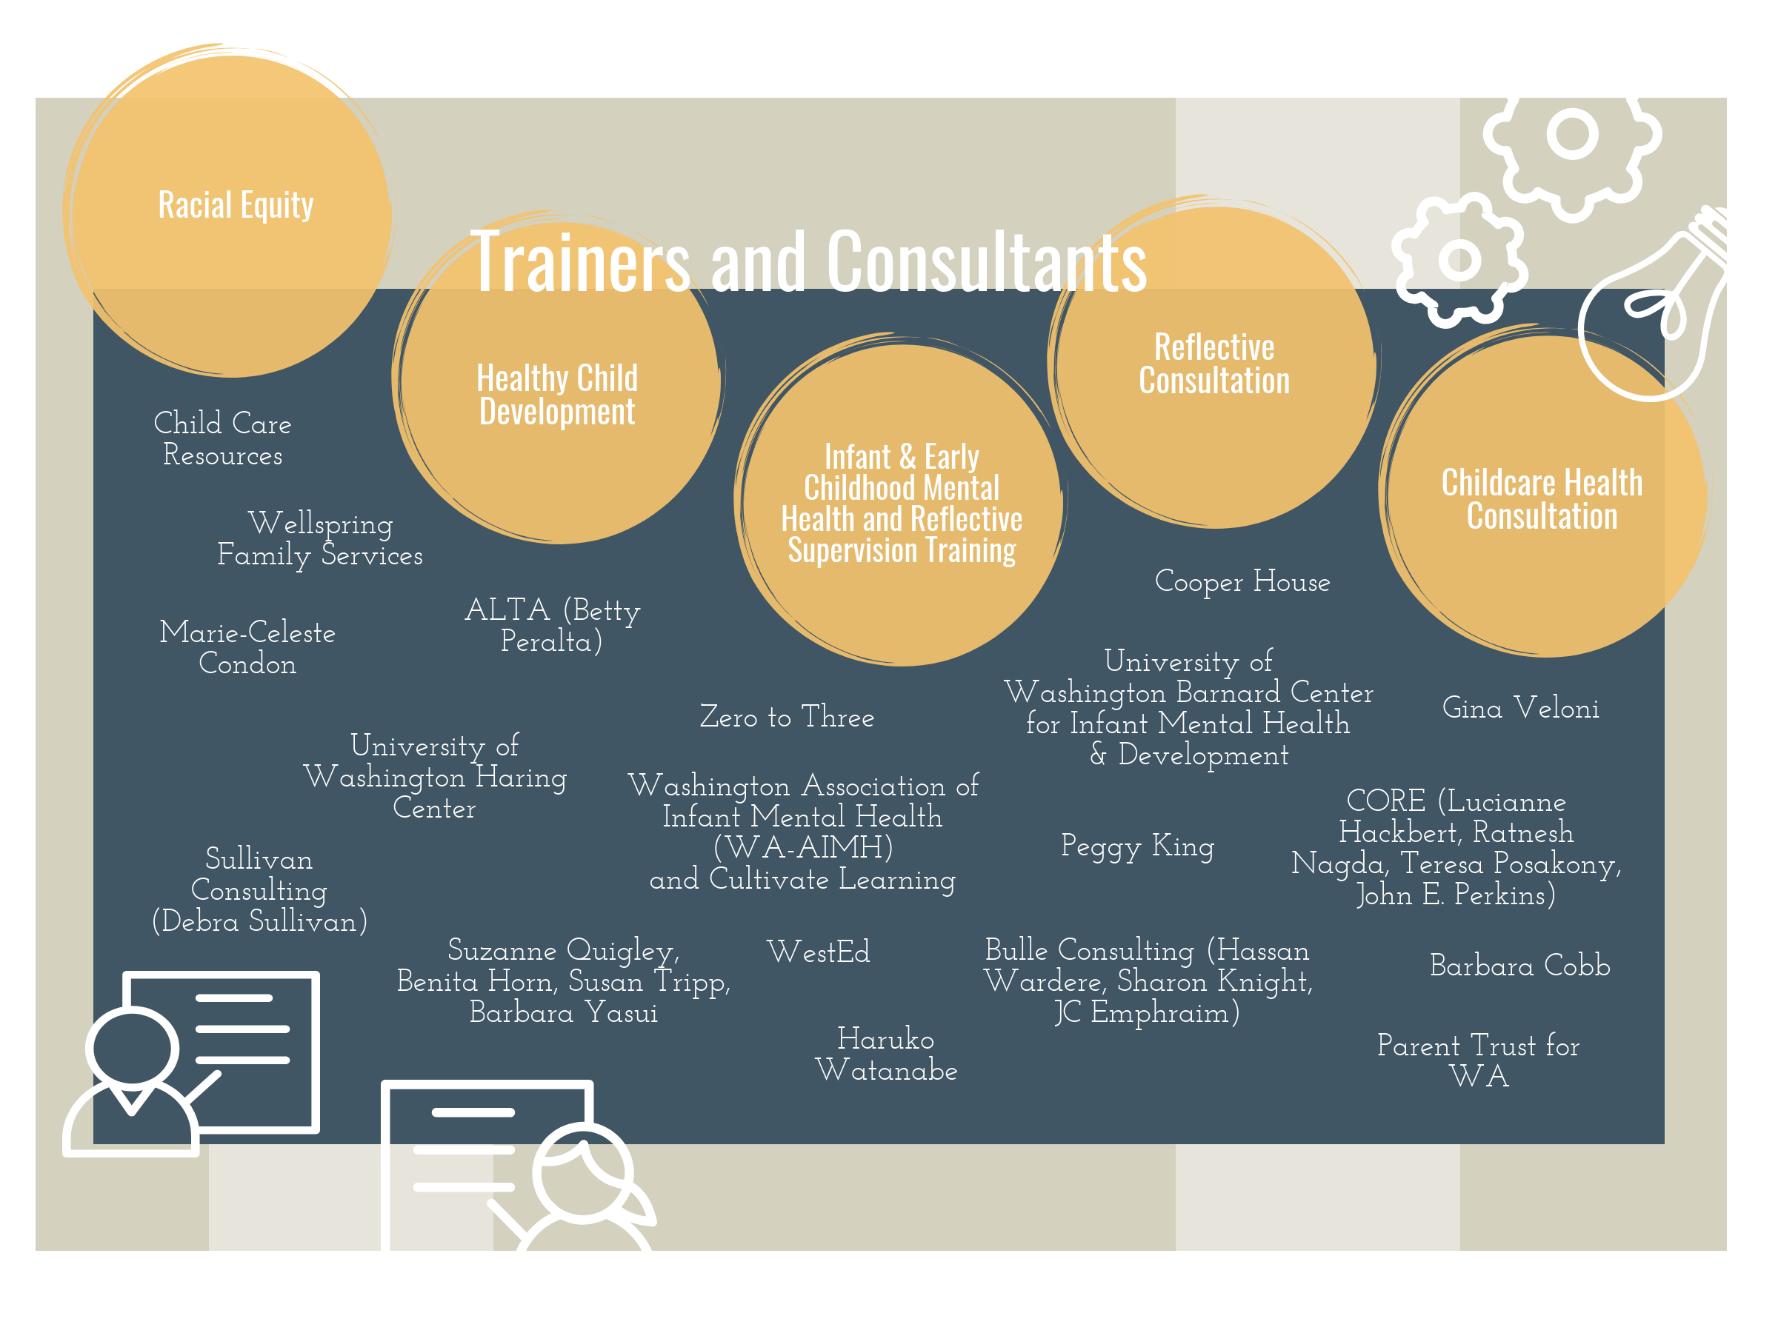 Workforce trainers